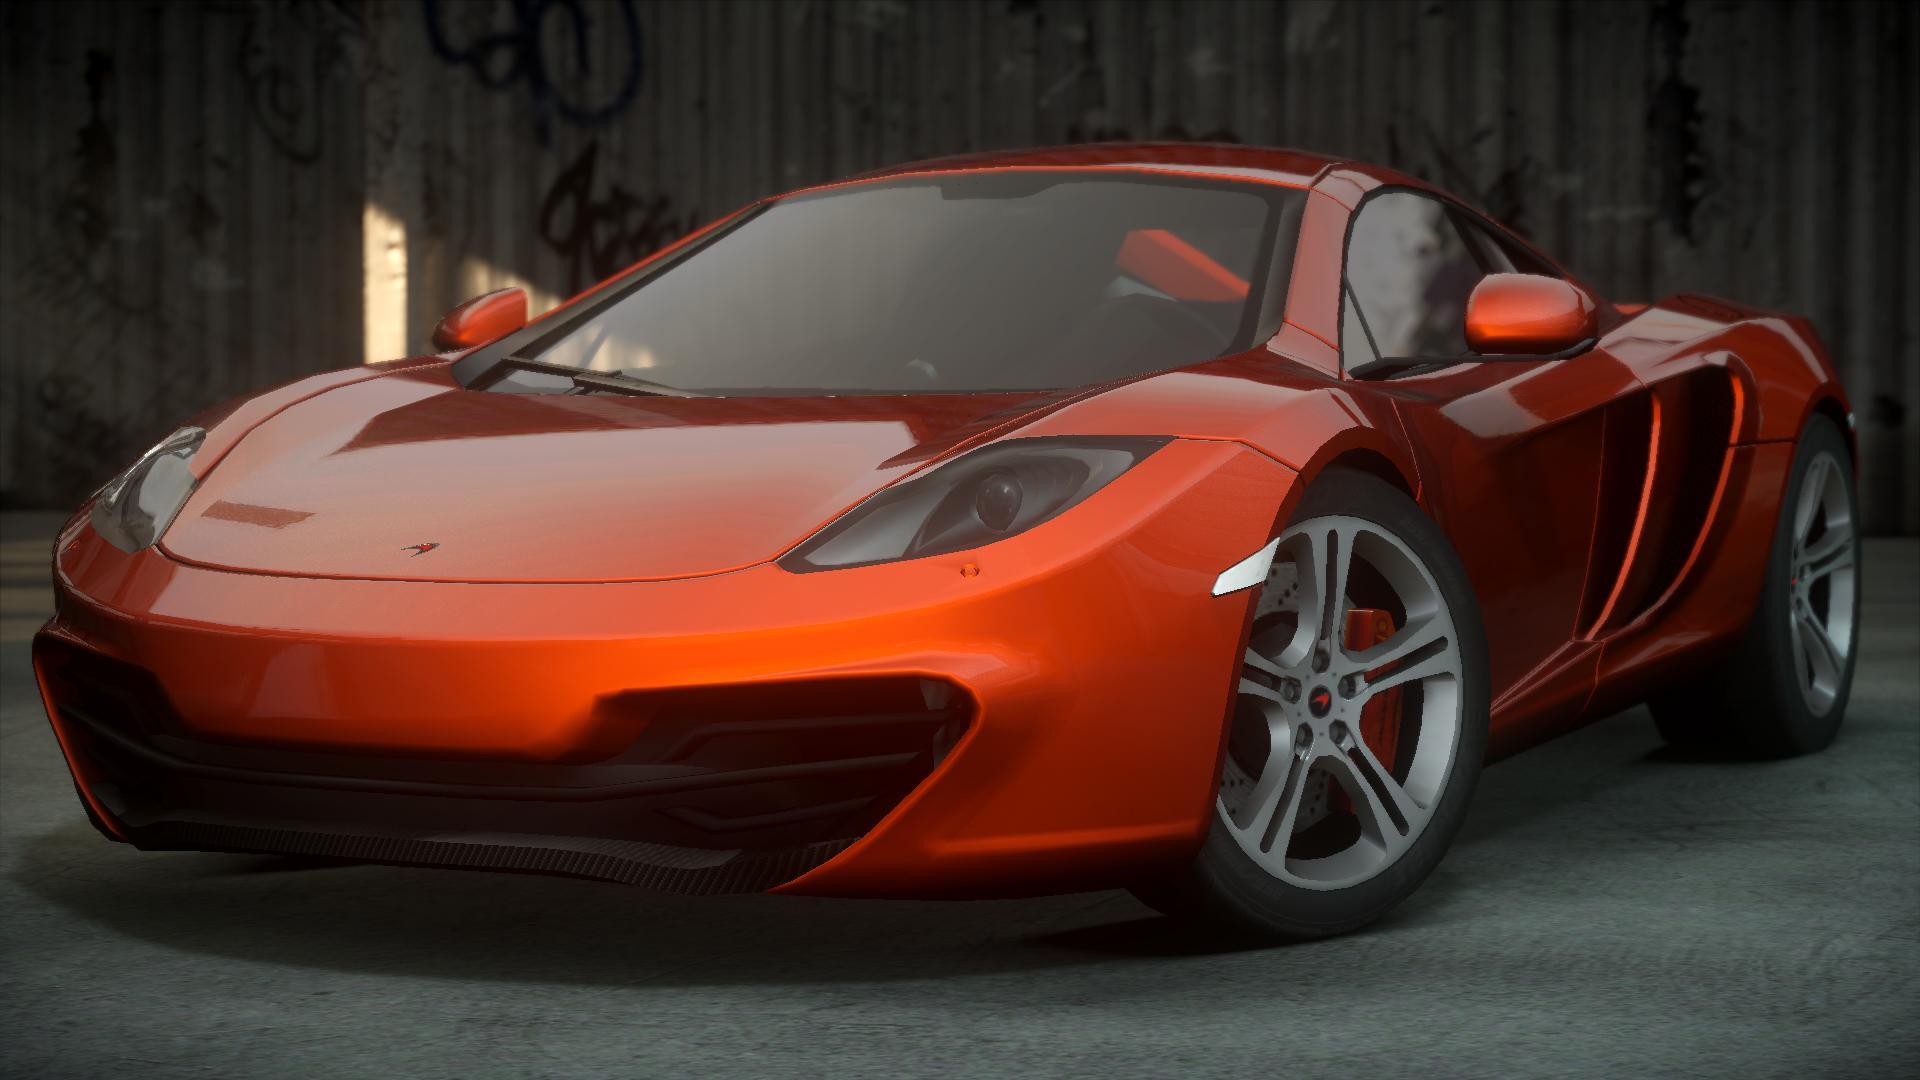 McLaren 12C (2013)